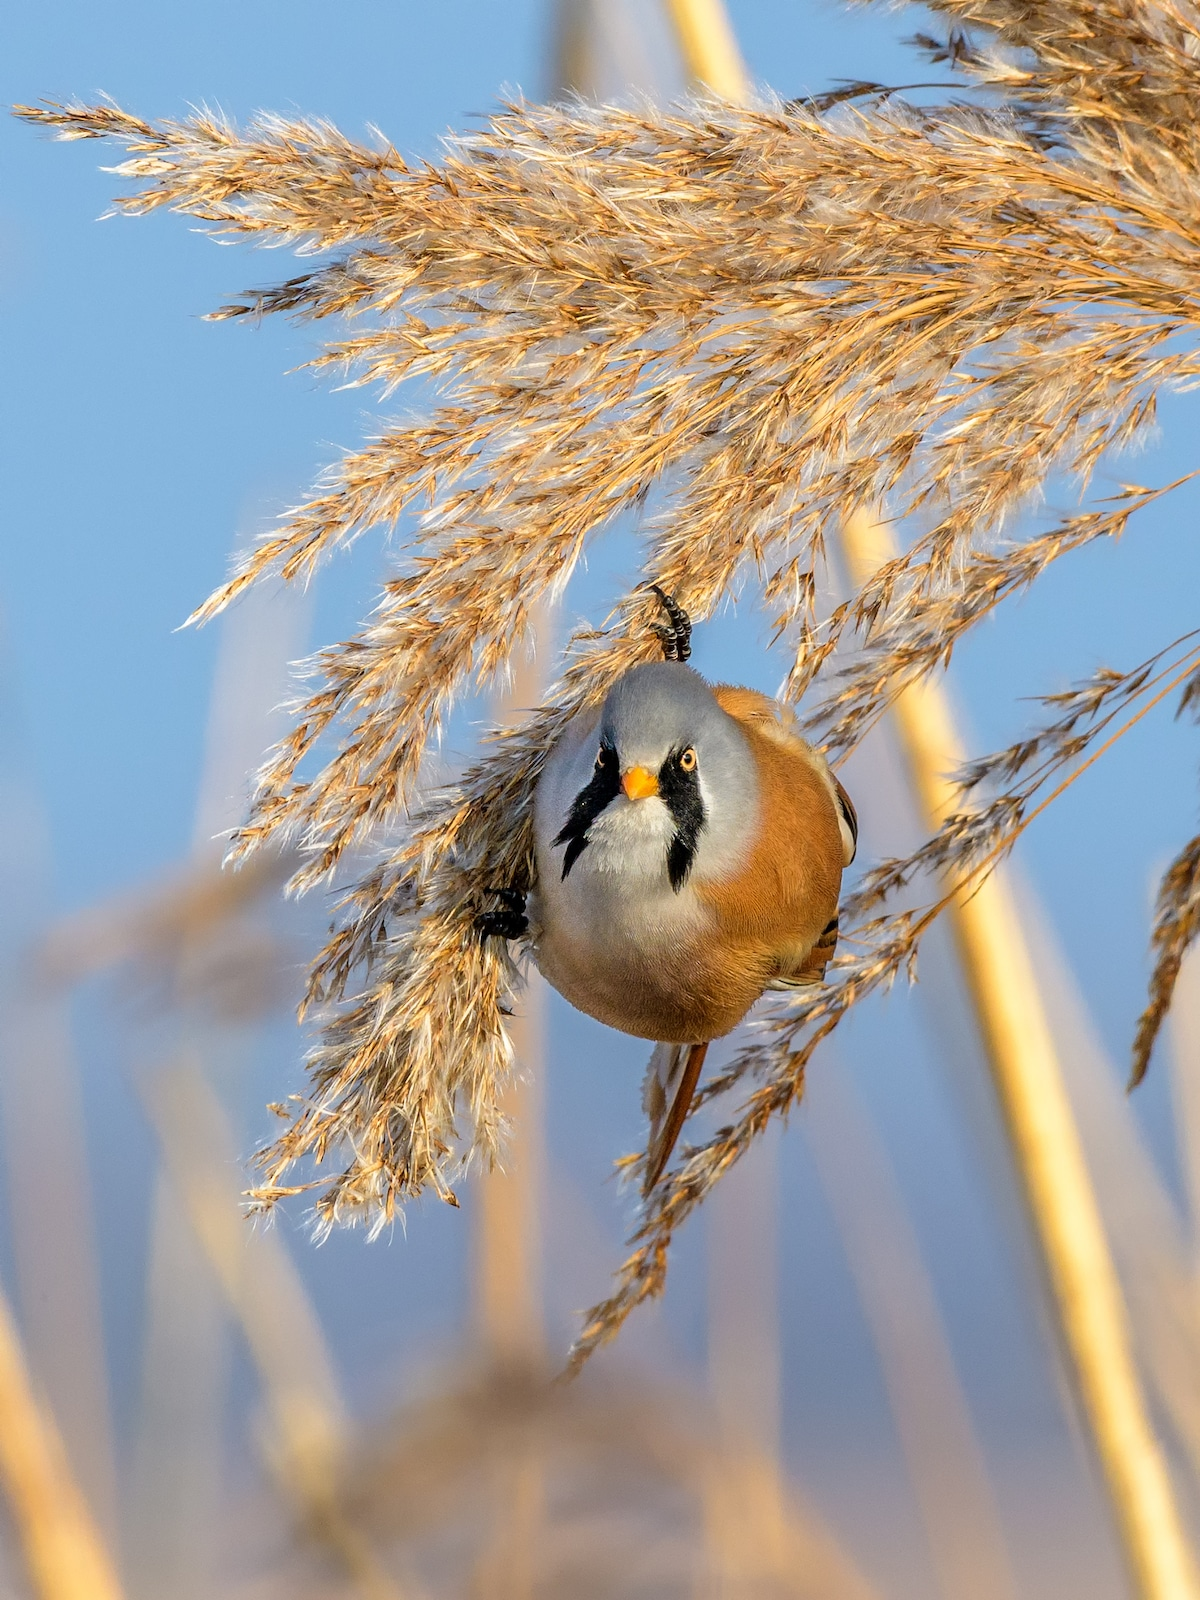 Bearded Reedling Balancing on Reeds